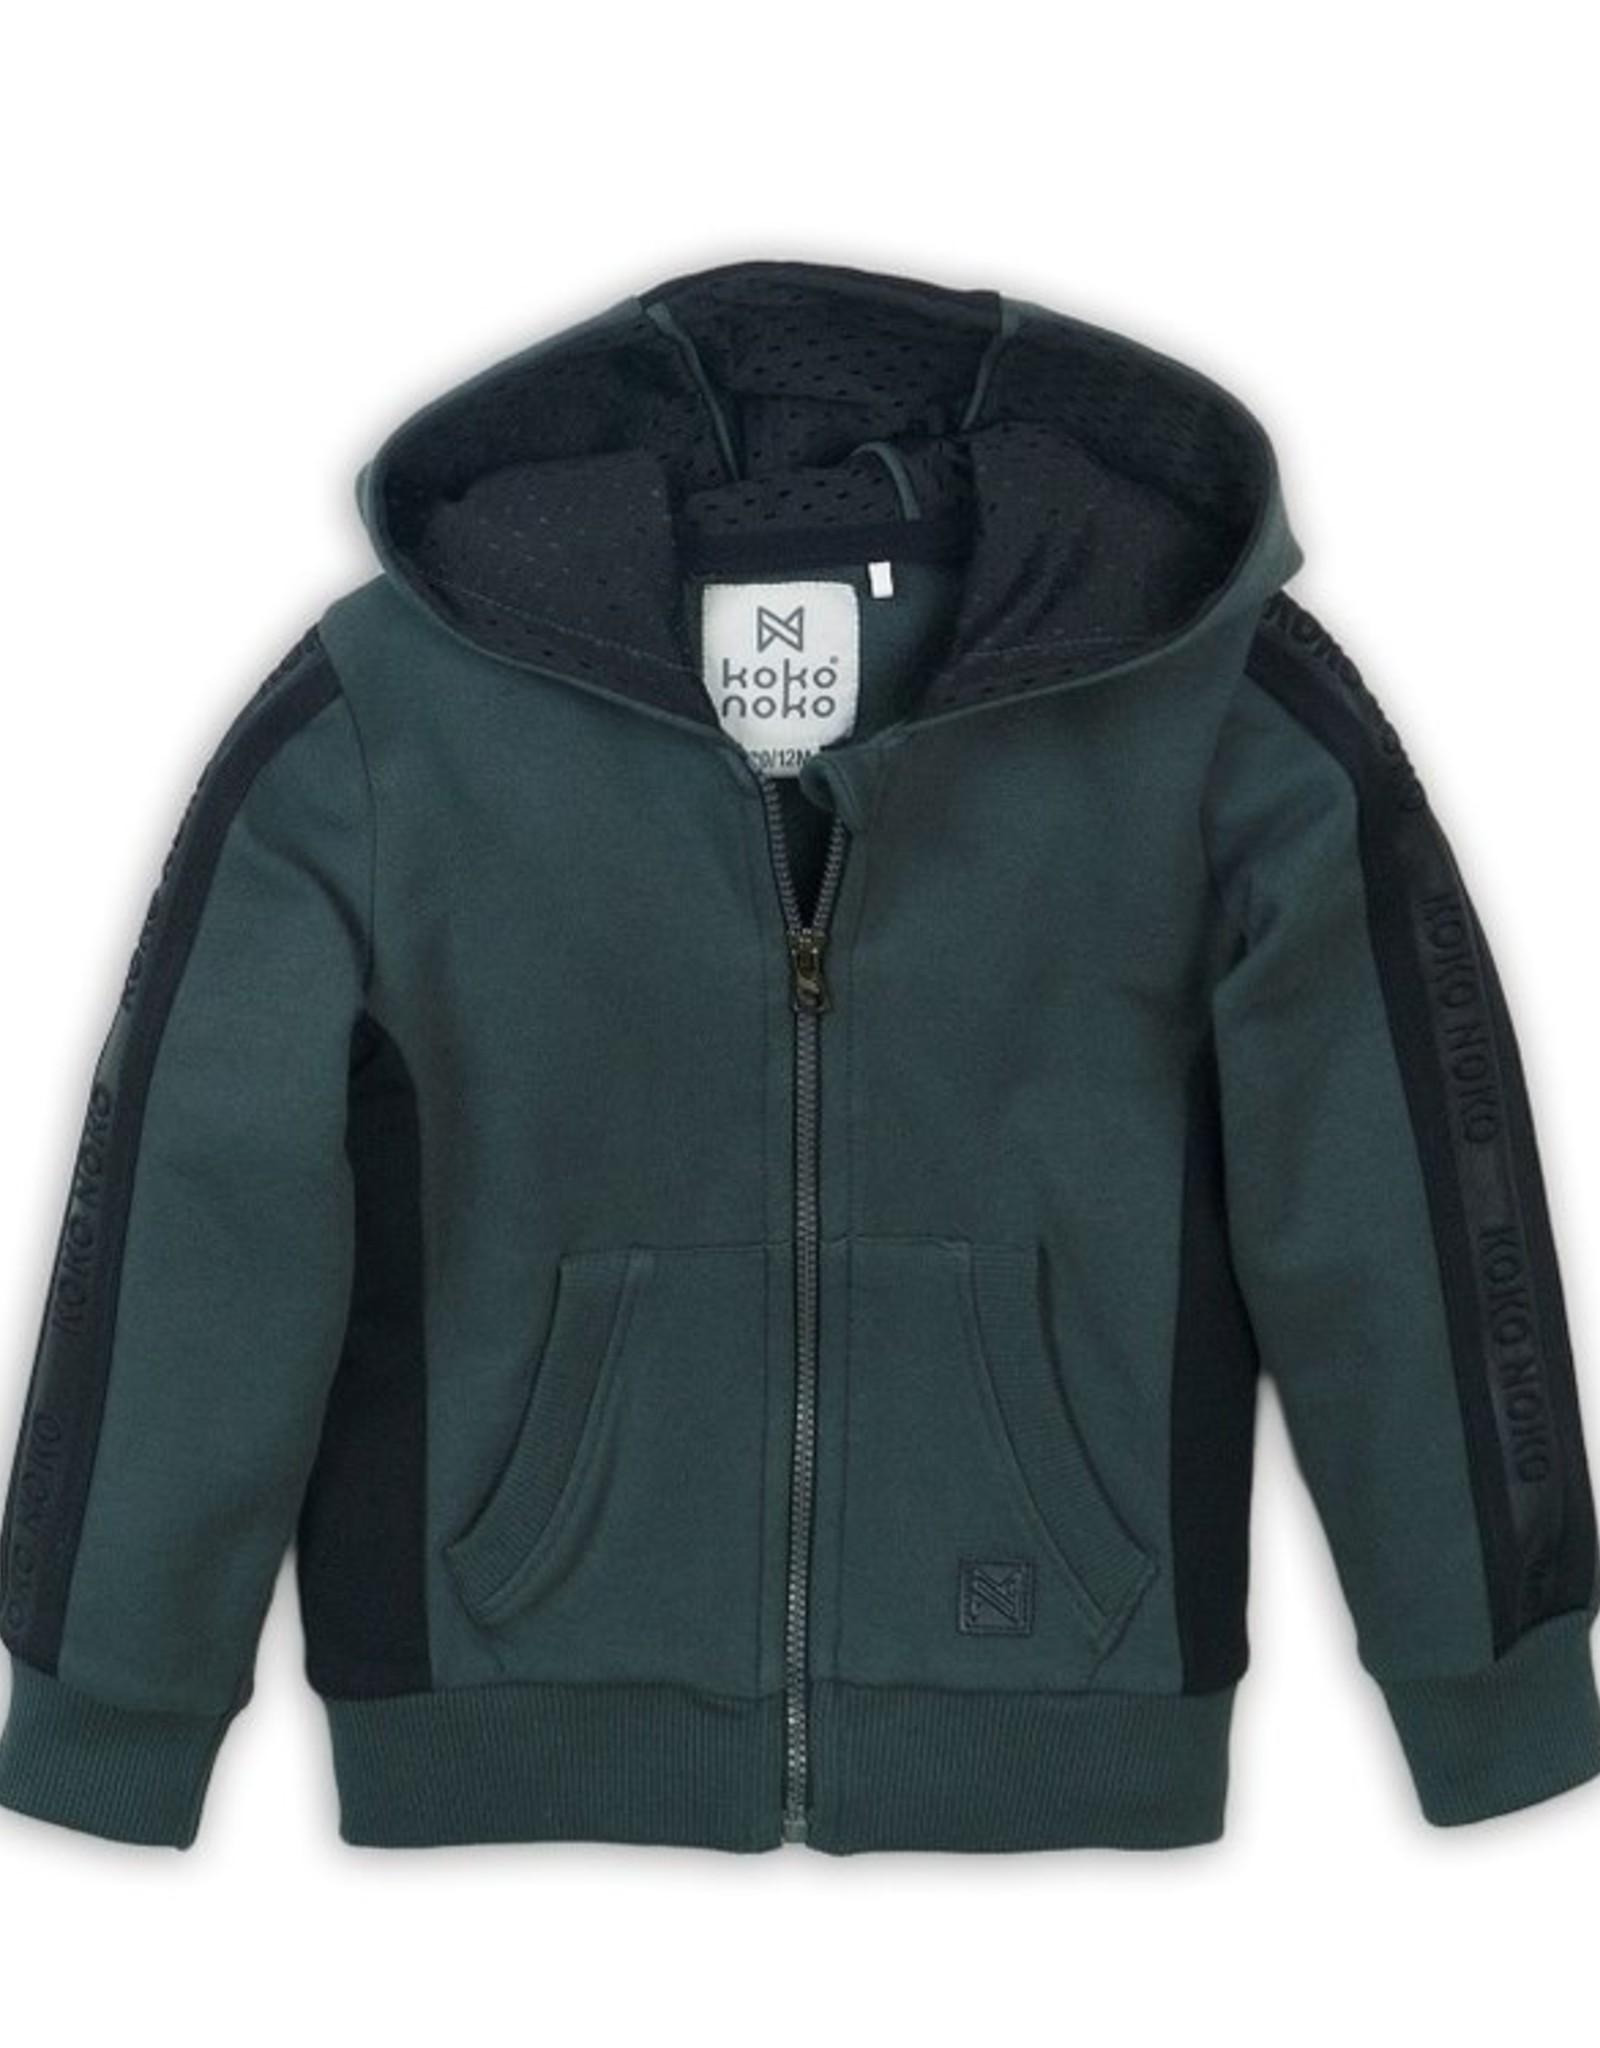 Koko Noko FA20 Full Zip Green Hoodie